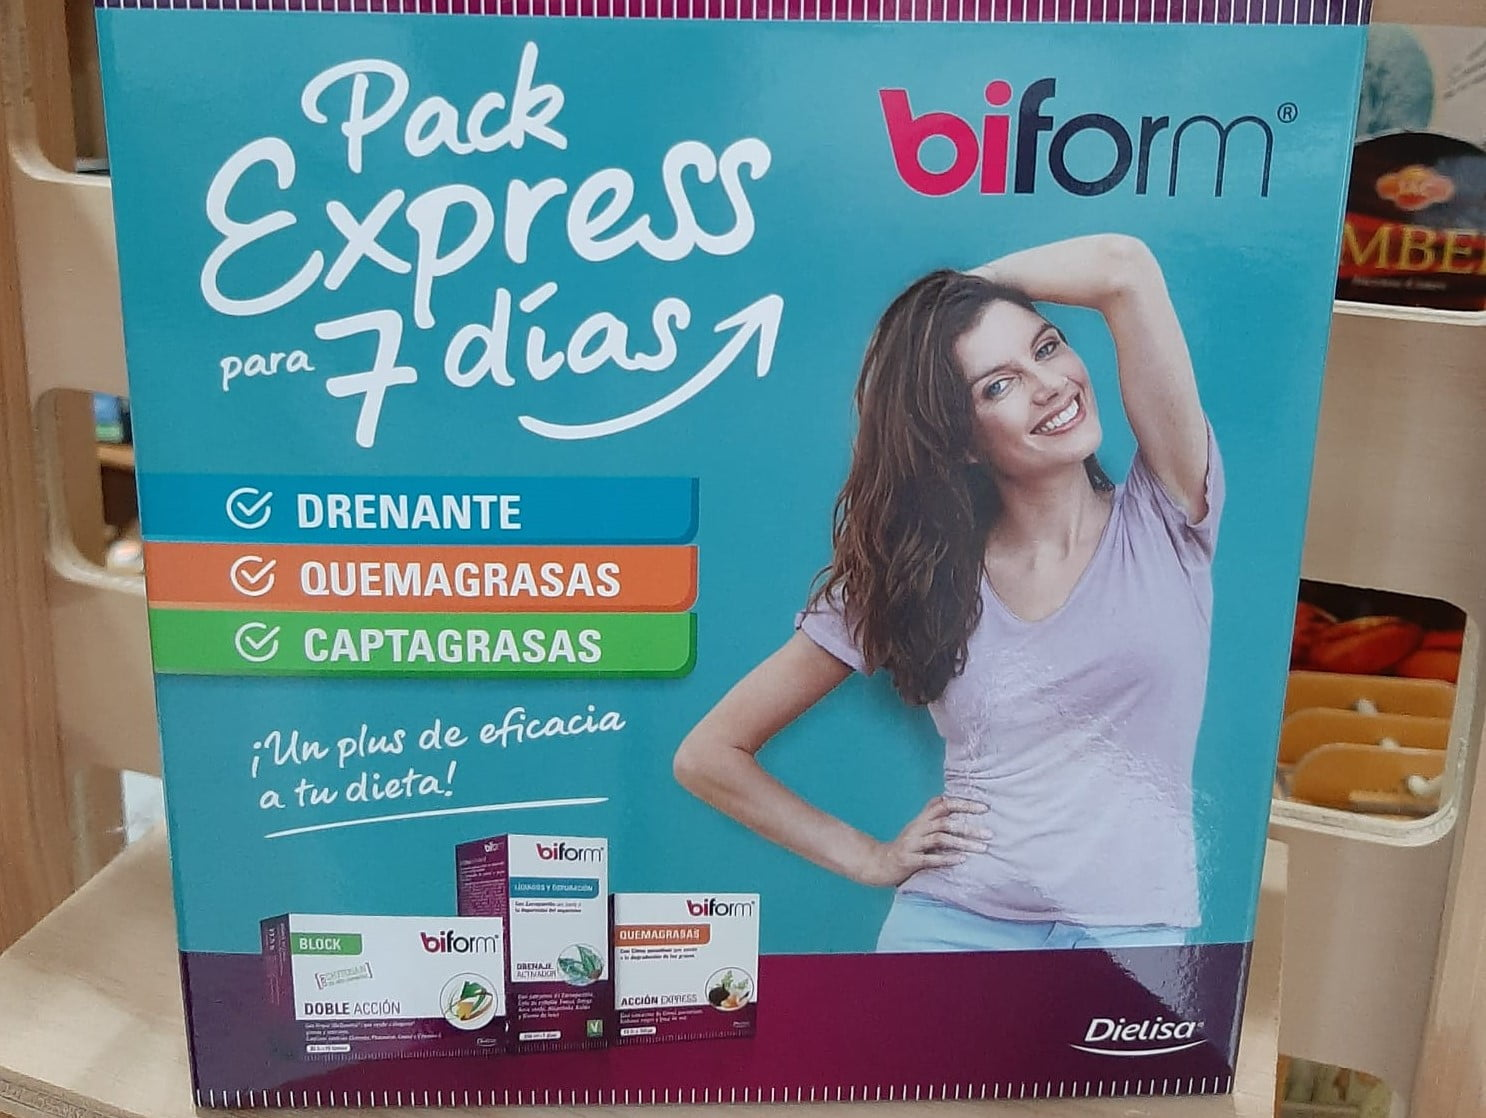 Pack dieta 7 dias express